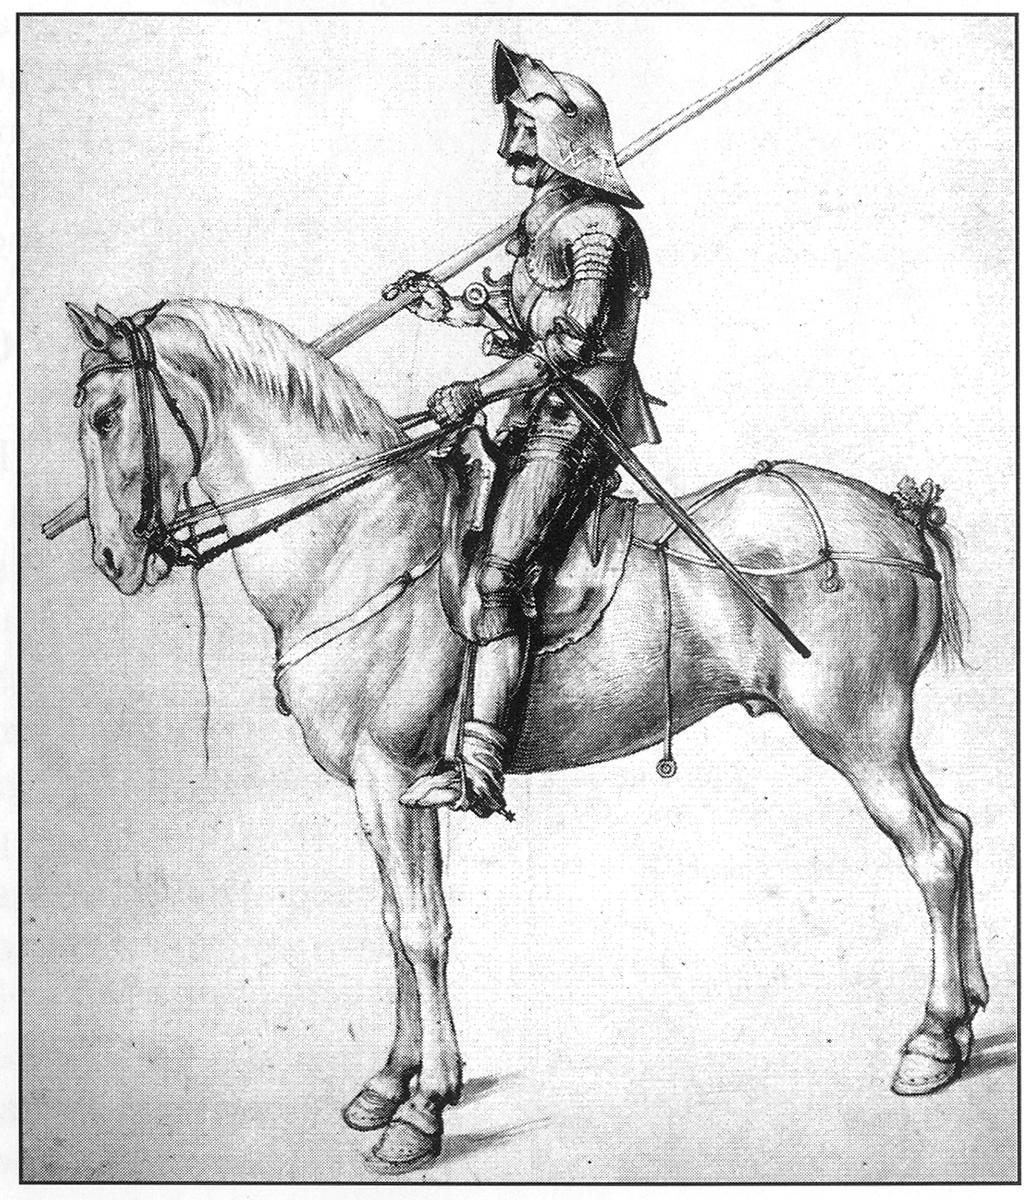 knight on horseback devdocsof horse pictures to print horseback on knight